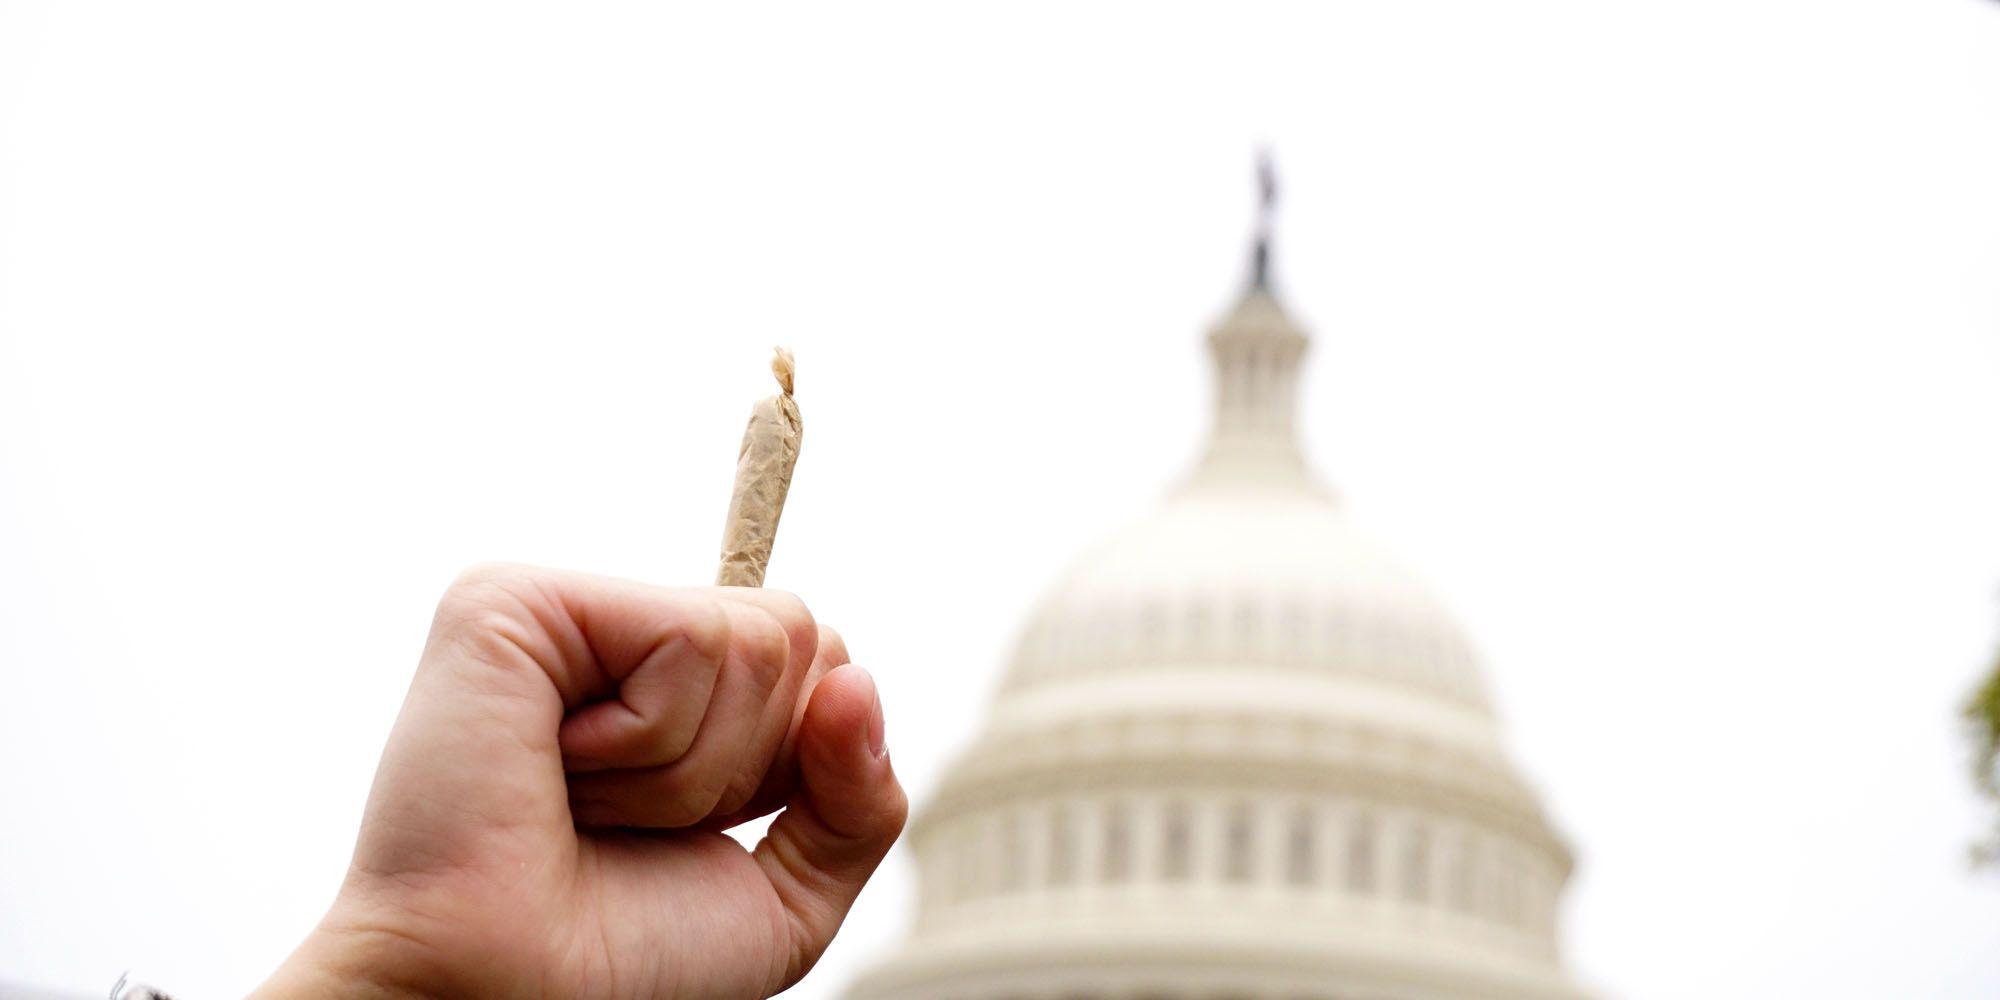 US-POLITICS-MARIJUANA